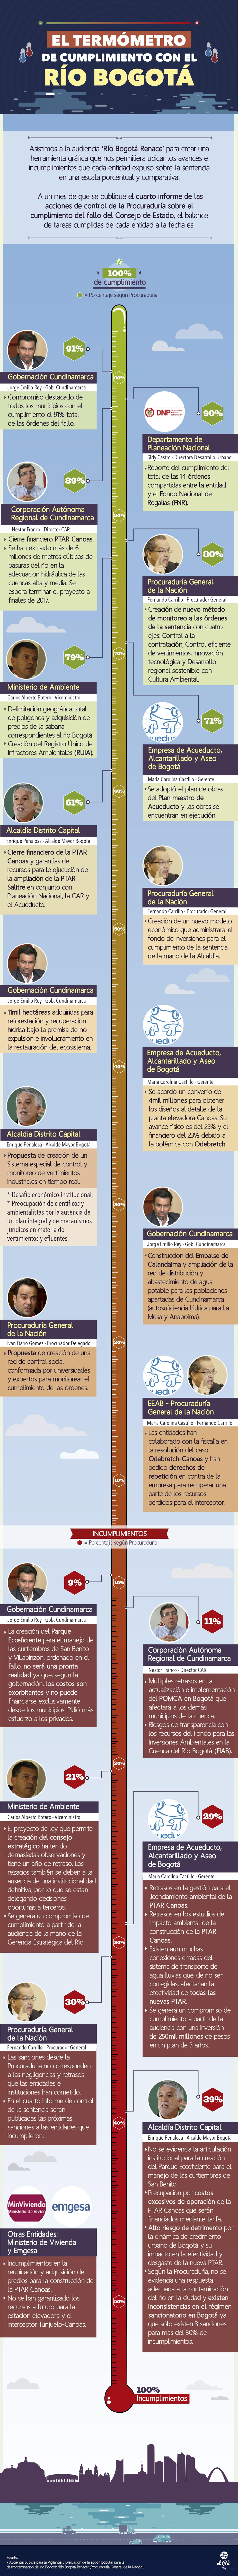 infografiatermometrodecumplimientoblogelrio-01